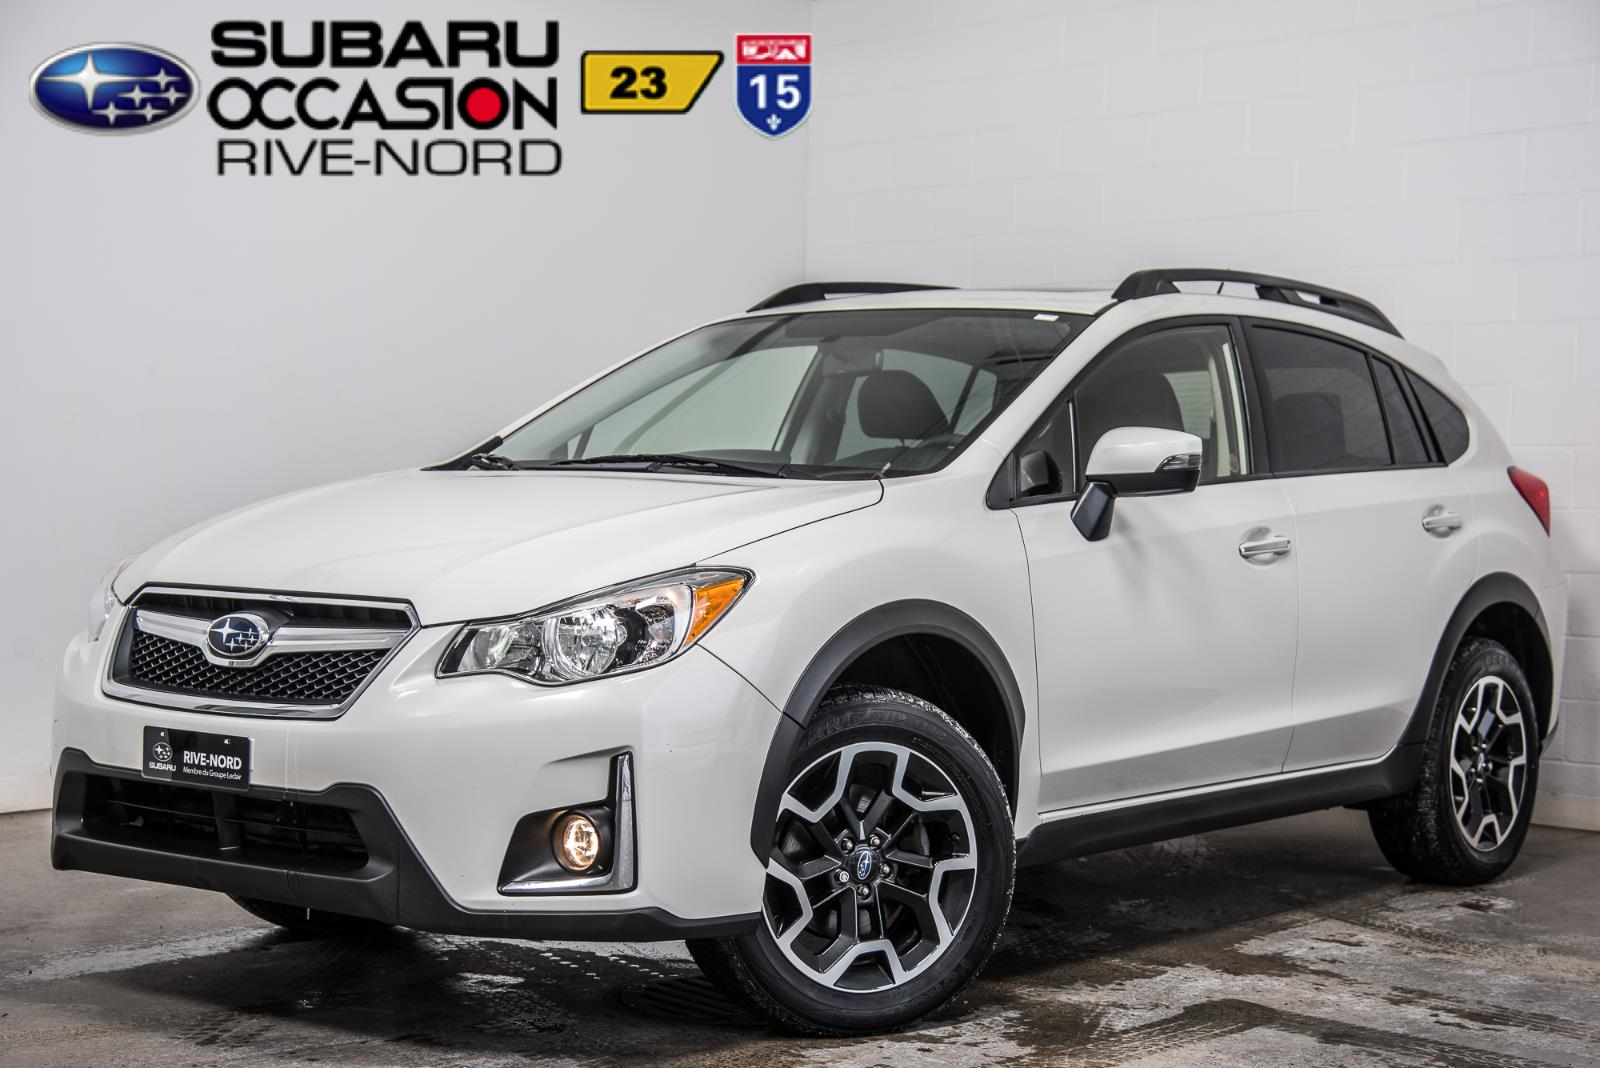 2016 Subaru Crosstrek Limited NAVI+CUIR+TOIT.OUVRANT #943679